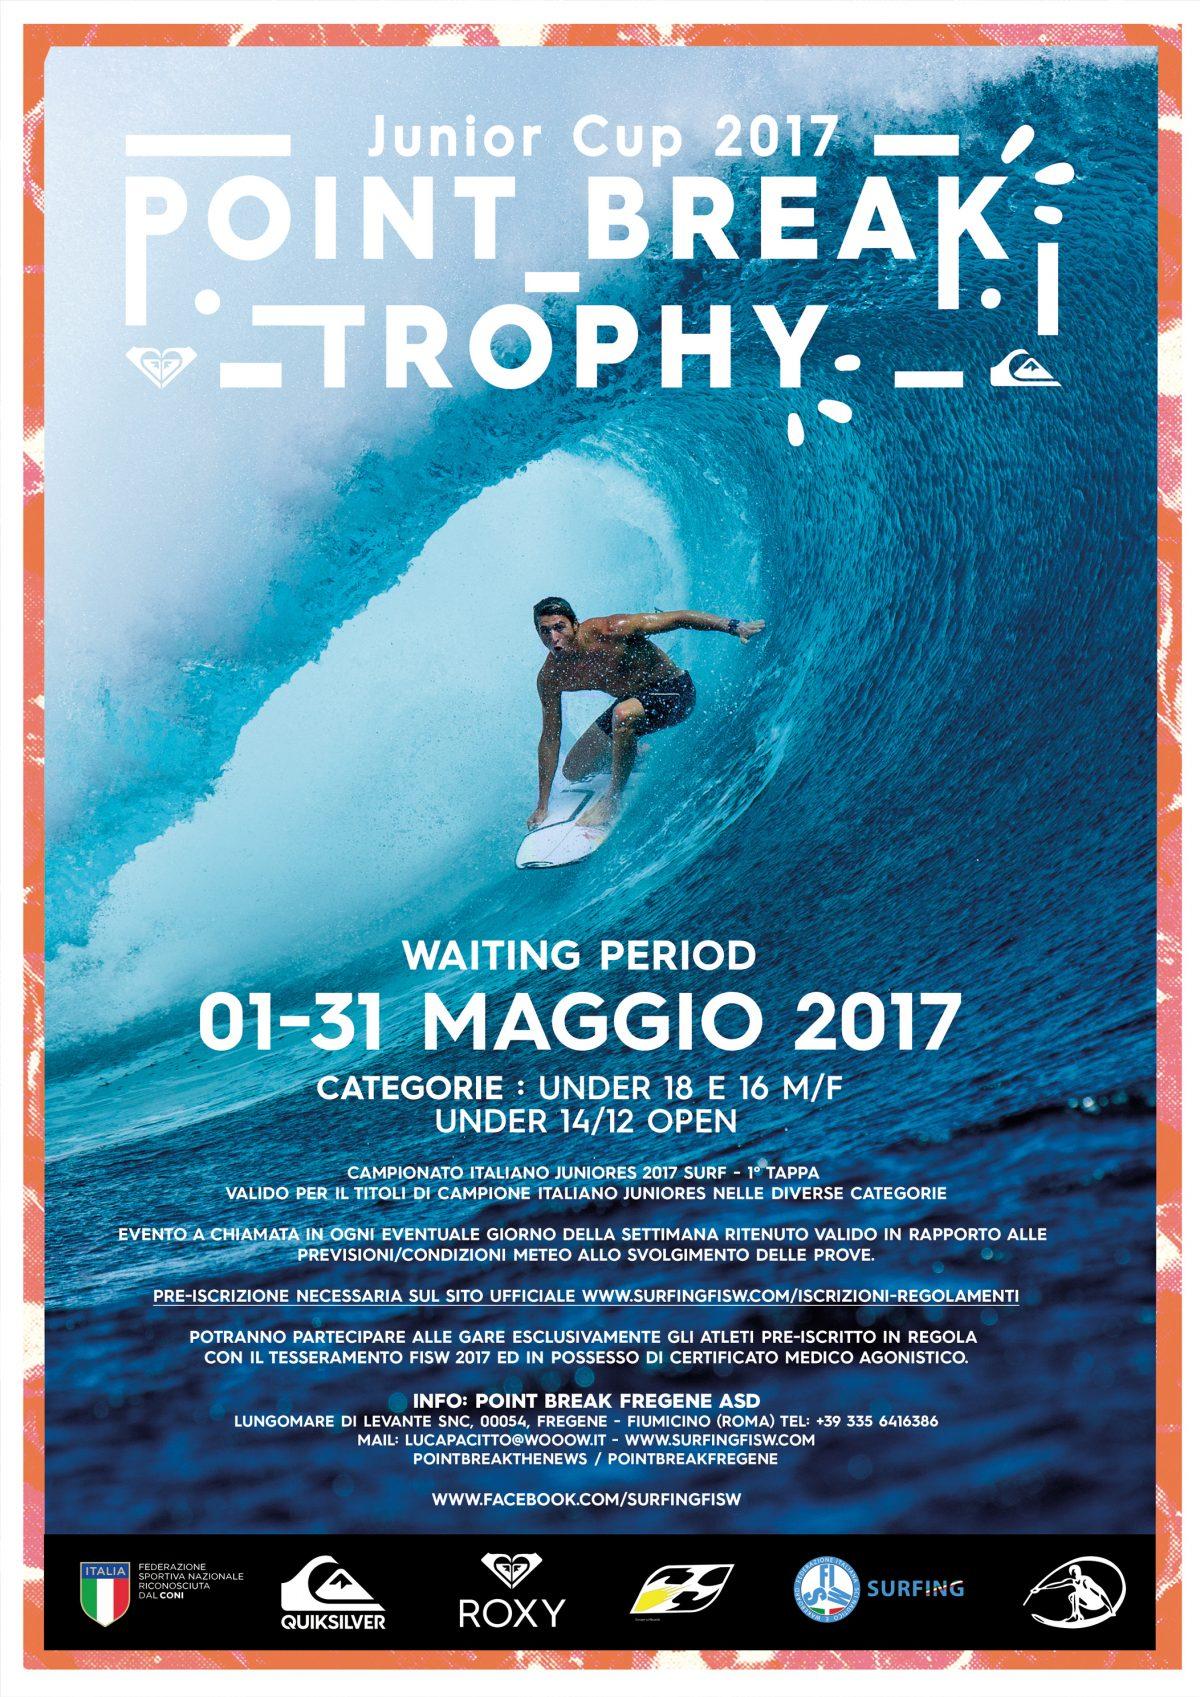 Point Break Trophy Junior Cup 2017